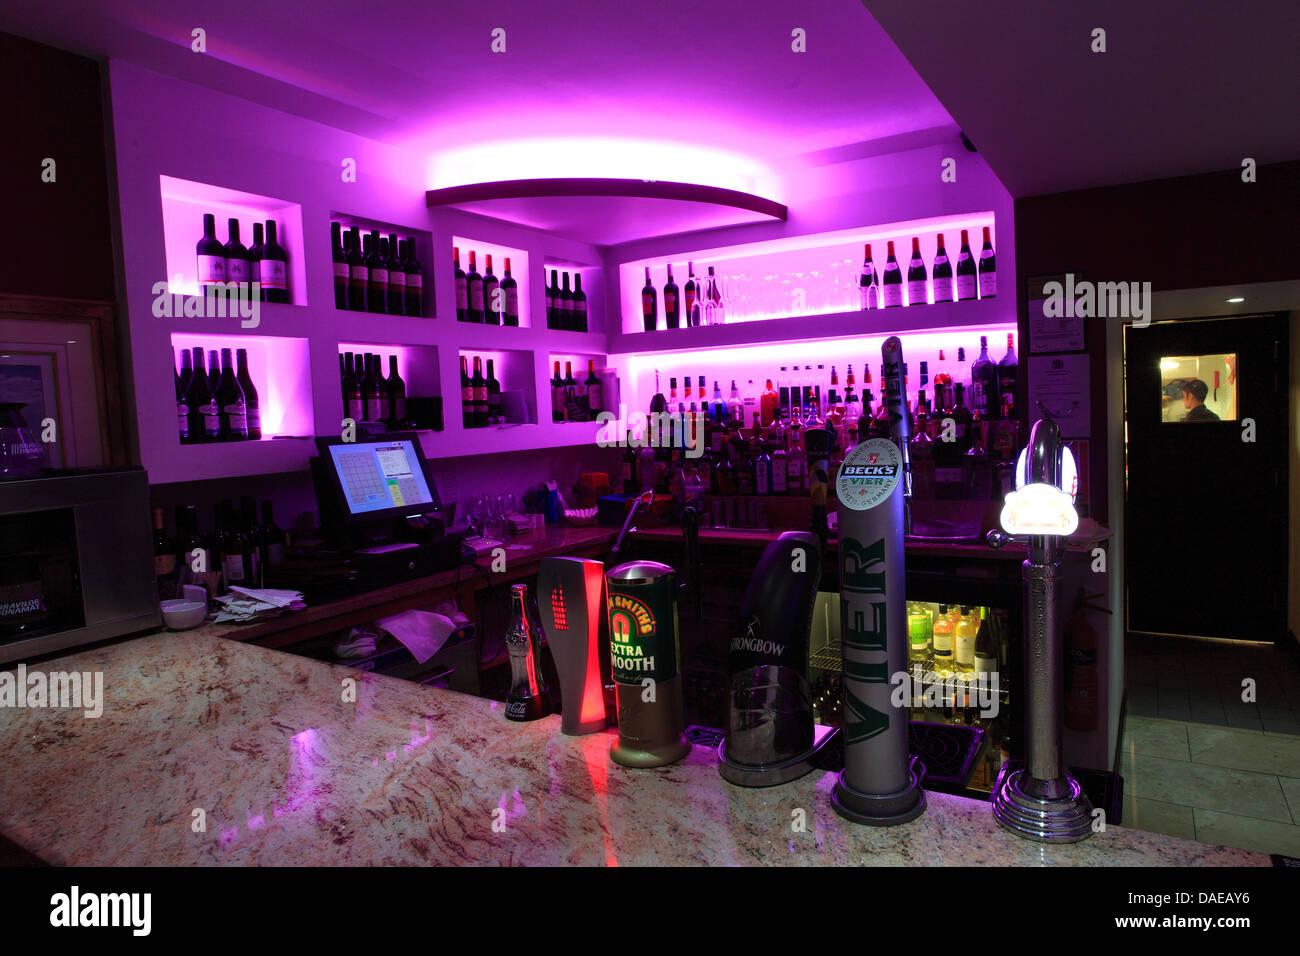 Modern Cafe Bar With Pink Subtle Lighting Public House